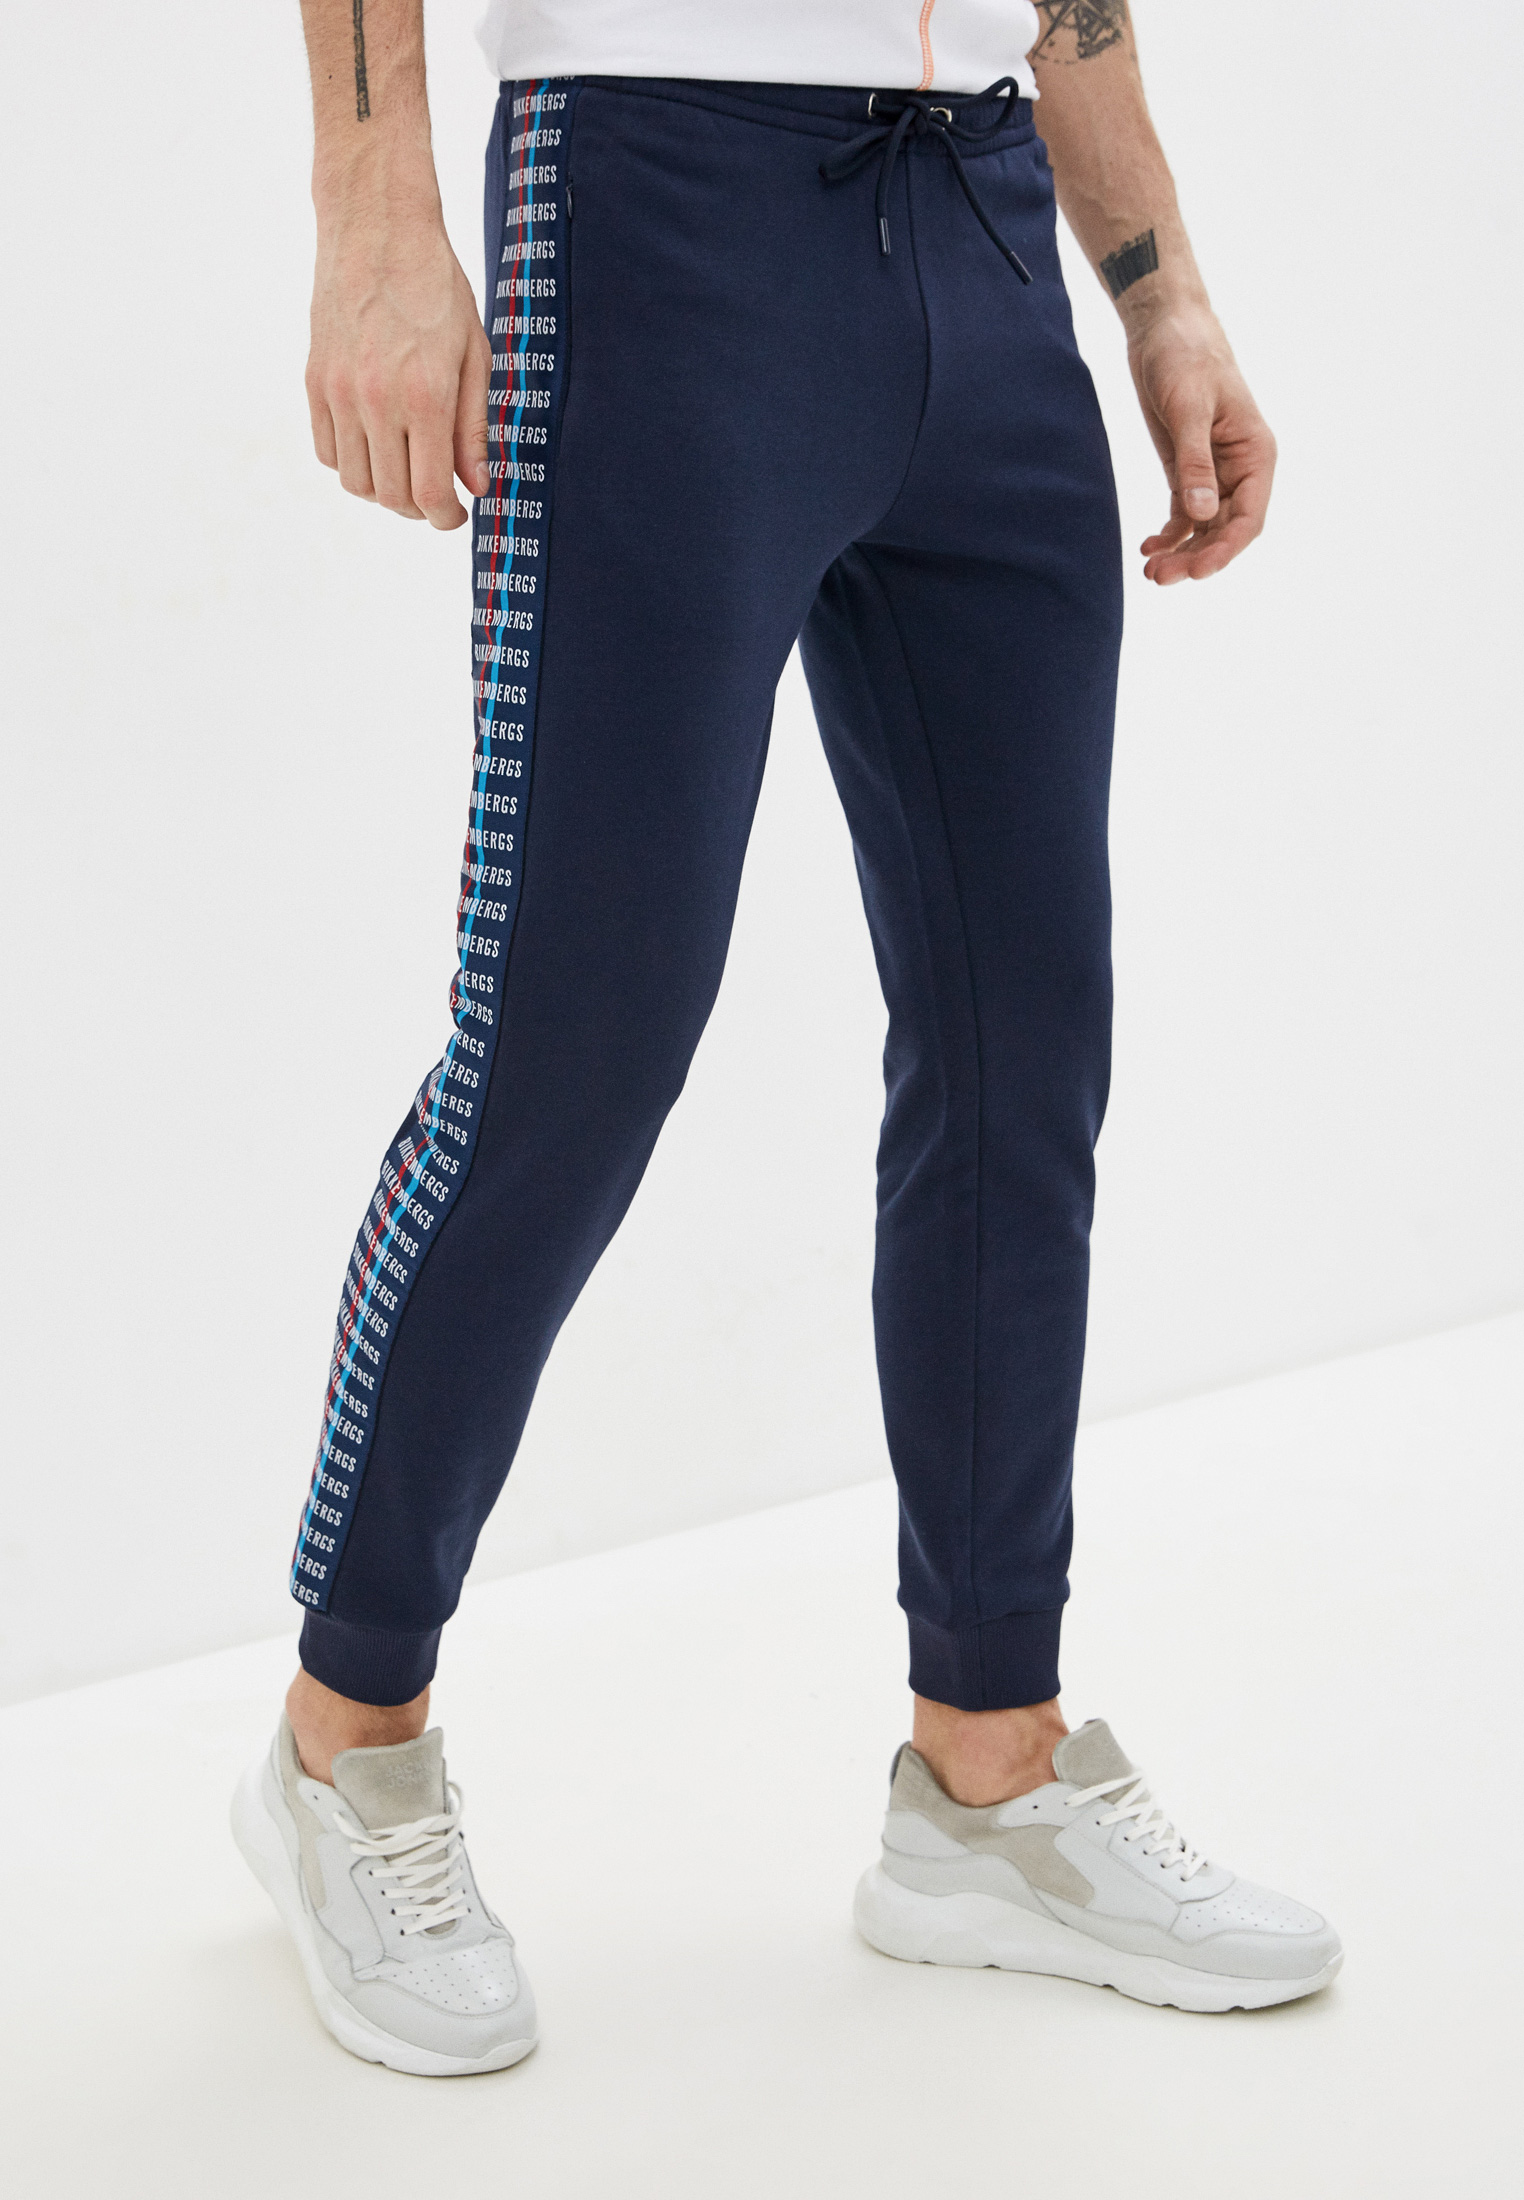 Мужские спортивные брюки Bikkembergs (Биккембергс) c 1 119 80 m 4188